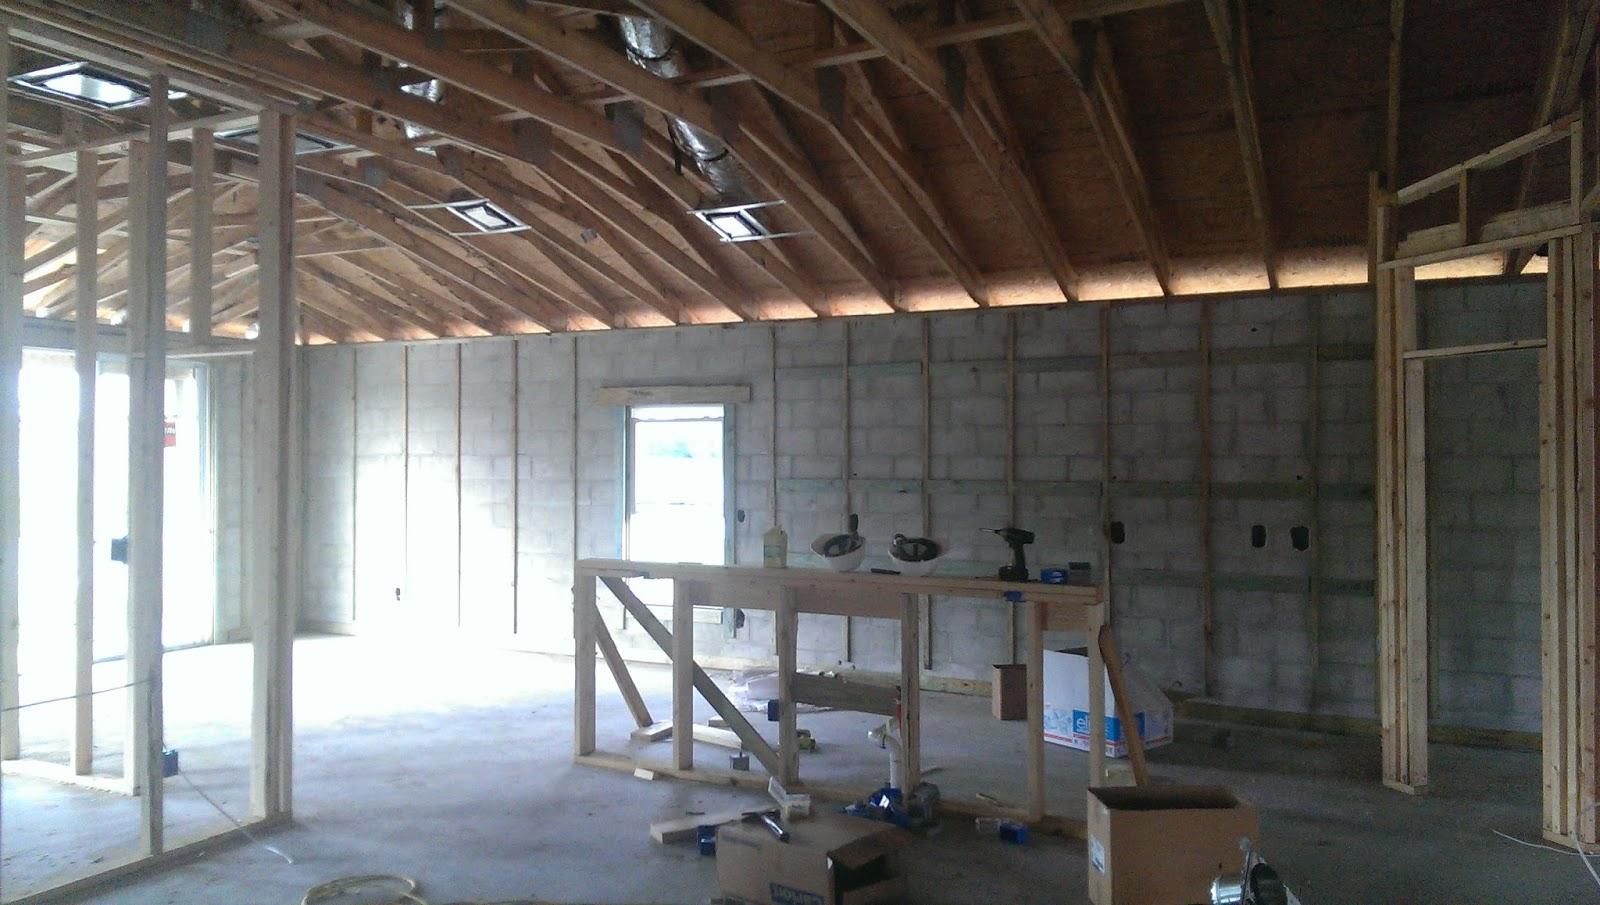 Building A Home With Dr Horton In Port Orange Plantation